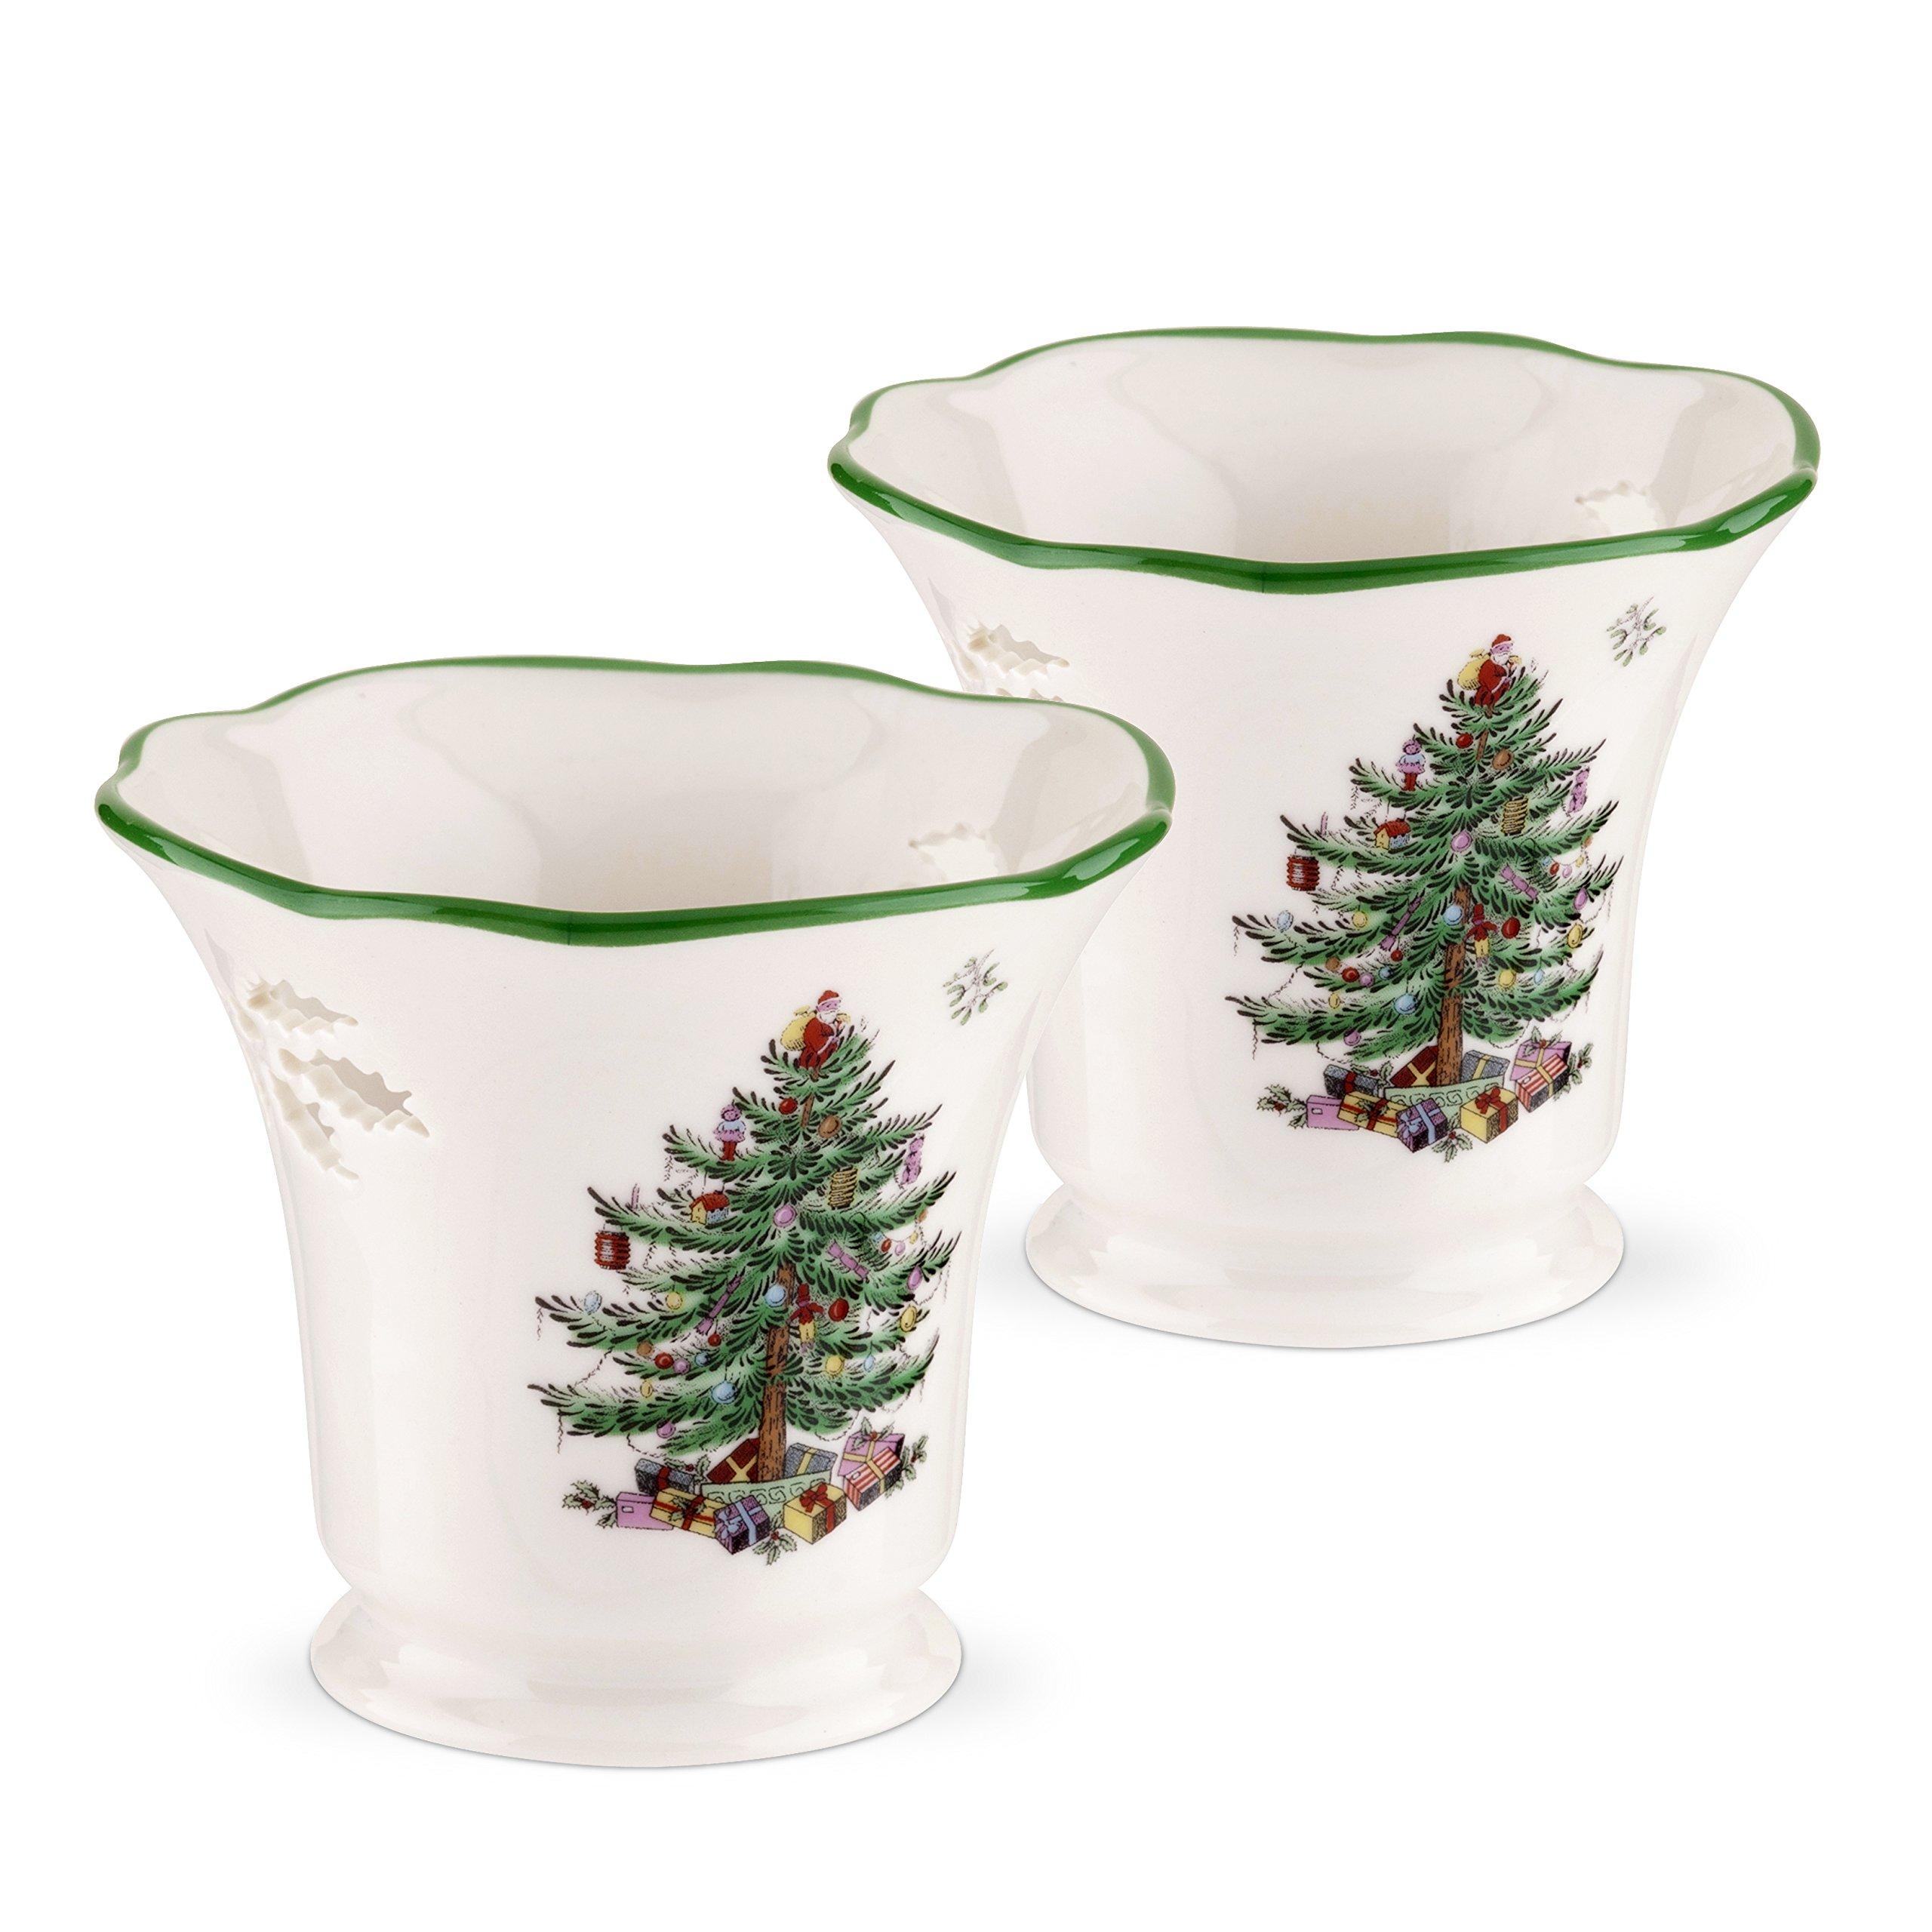 Spode Christmas Tree Pierced Tea Light Holder with Tea Lights, Set of 2